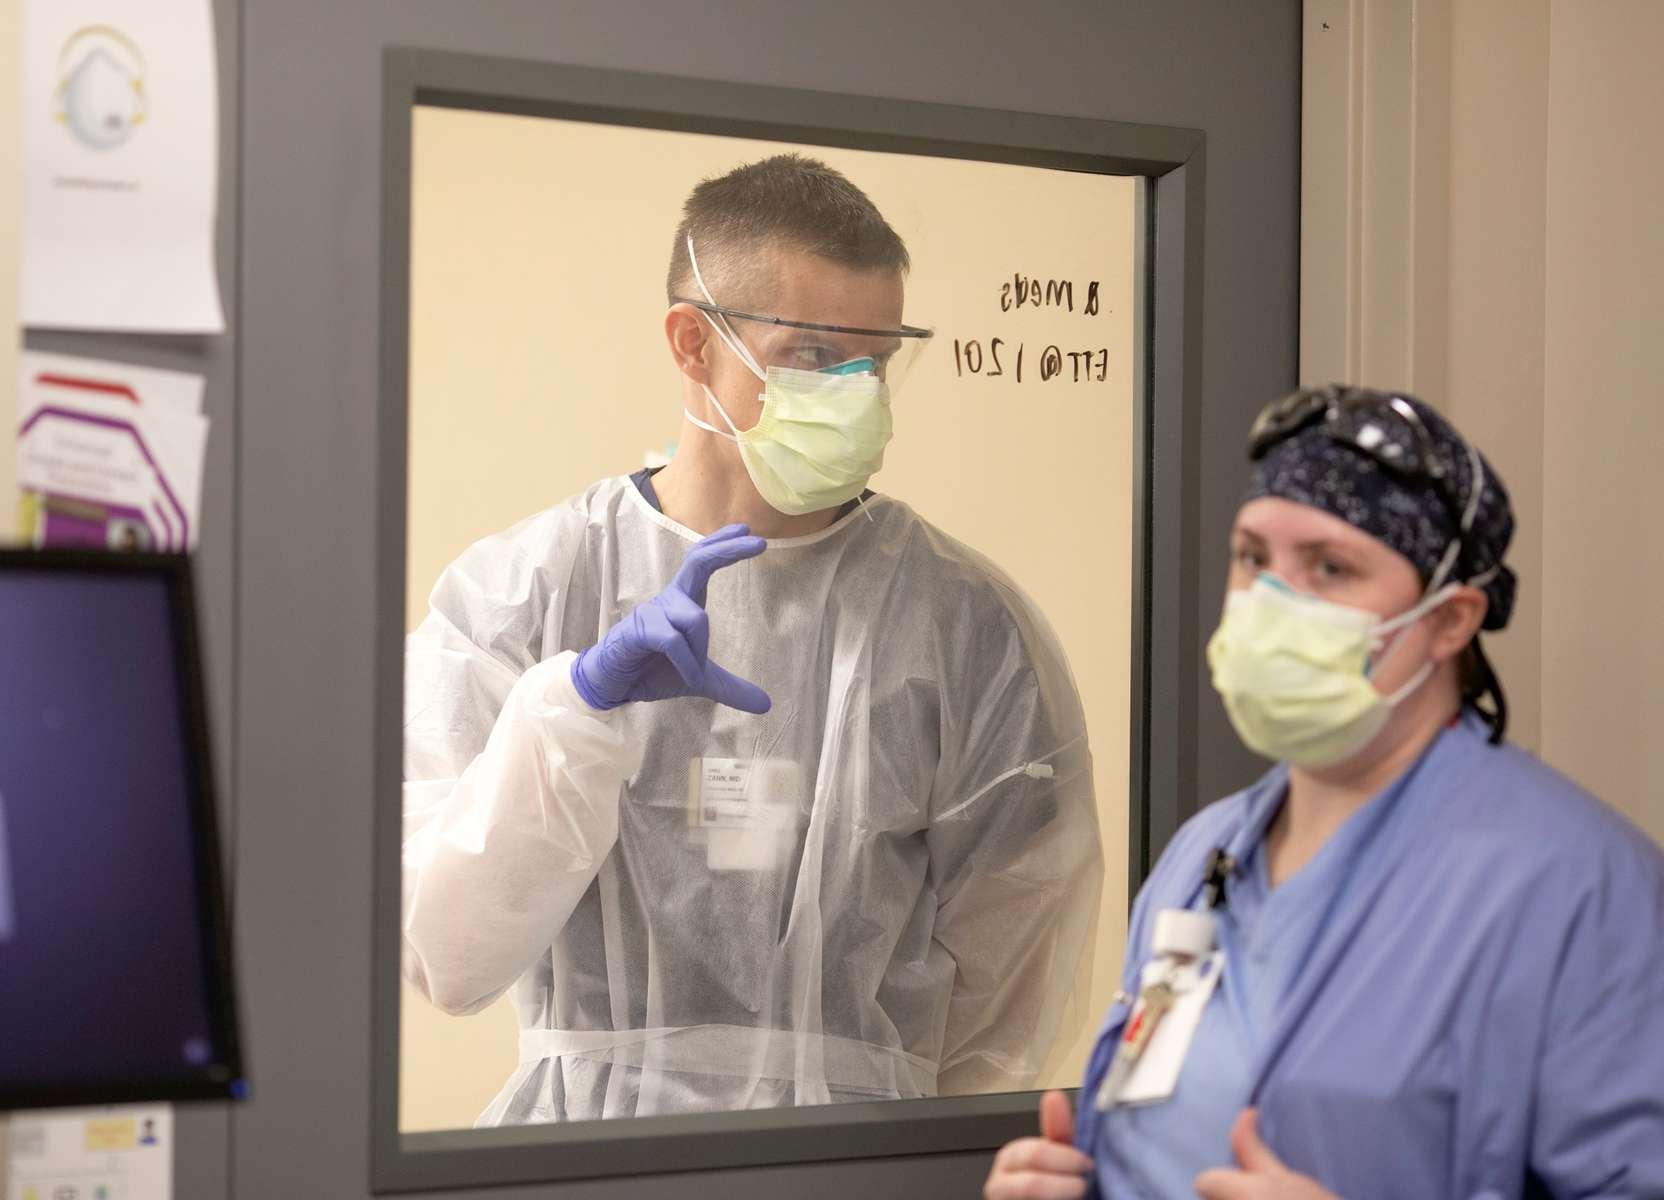 April 13, 2020. COVID Coverage. Emergency Department at IU Health Methodist Hospital Monday April 13, 2020.